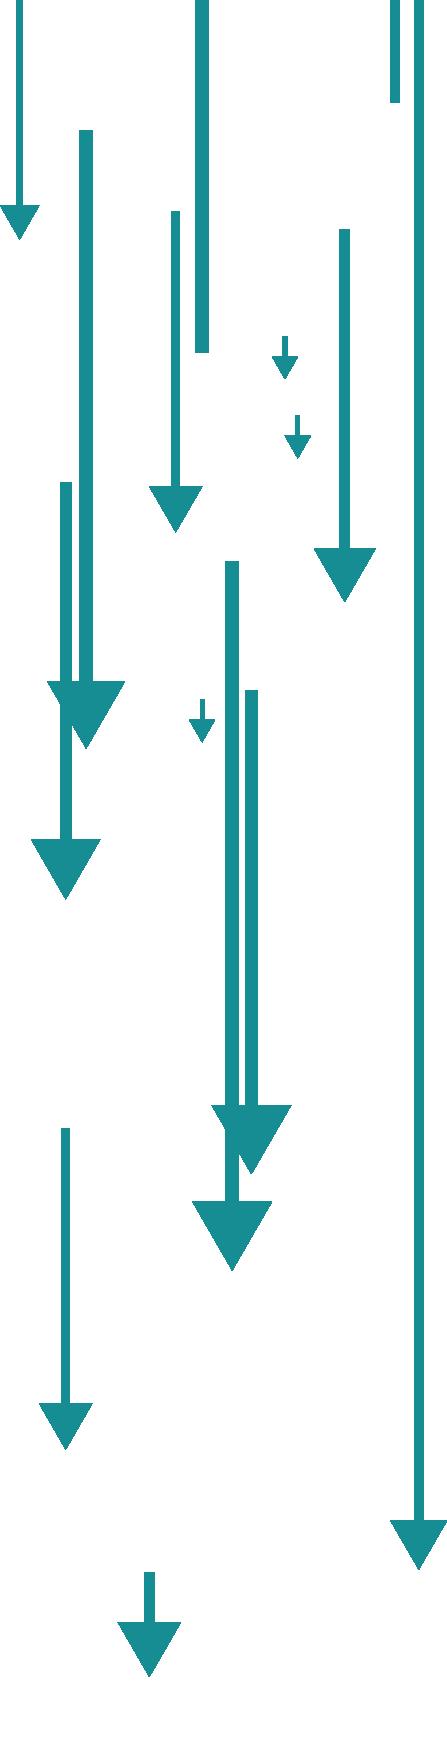 arrows.png